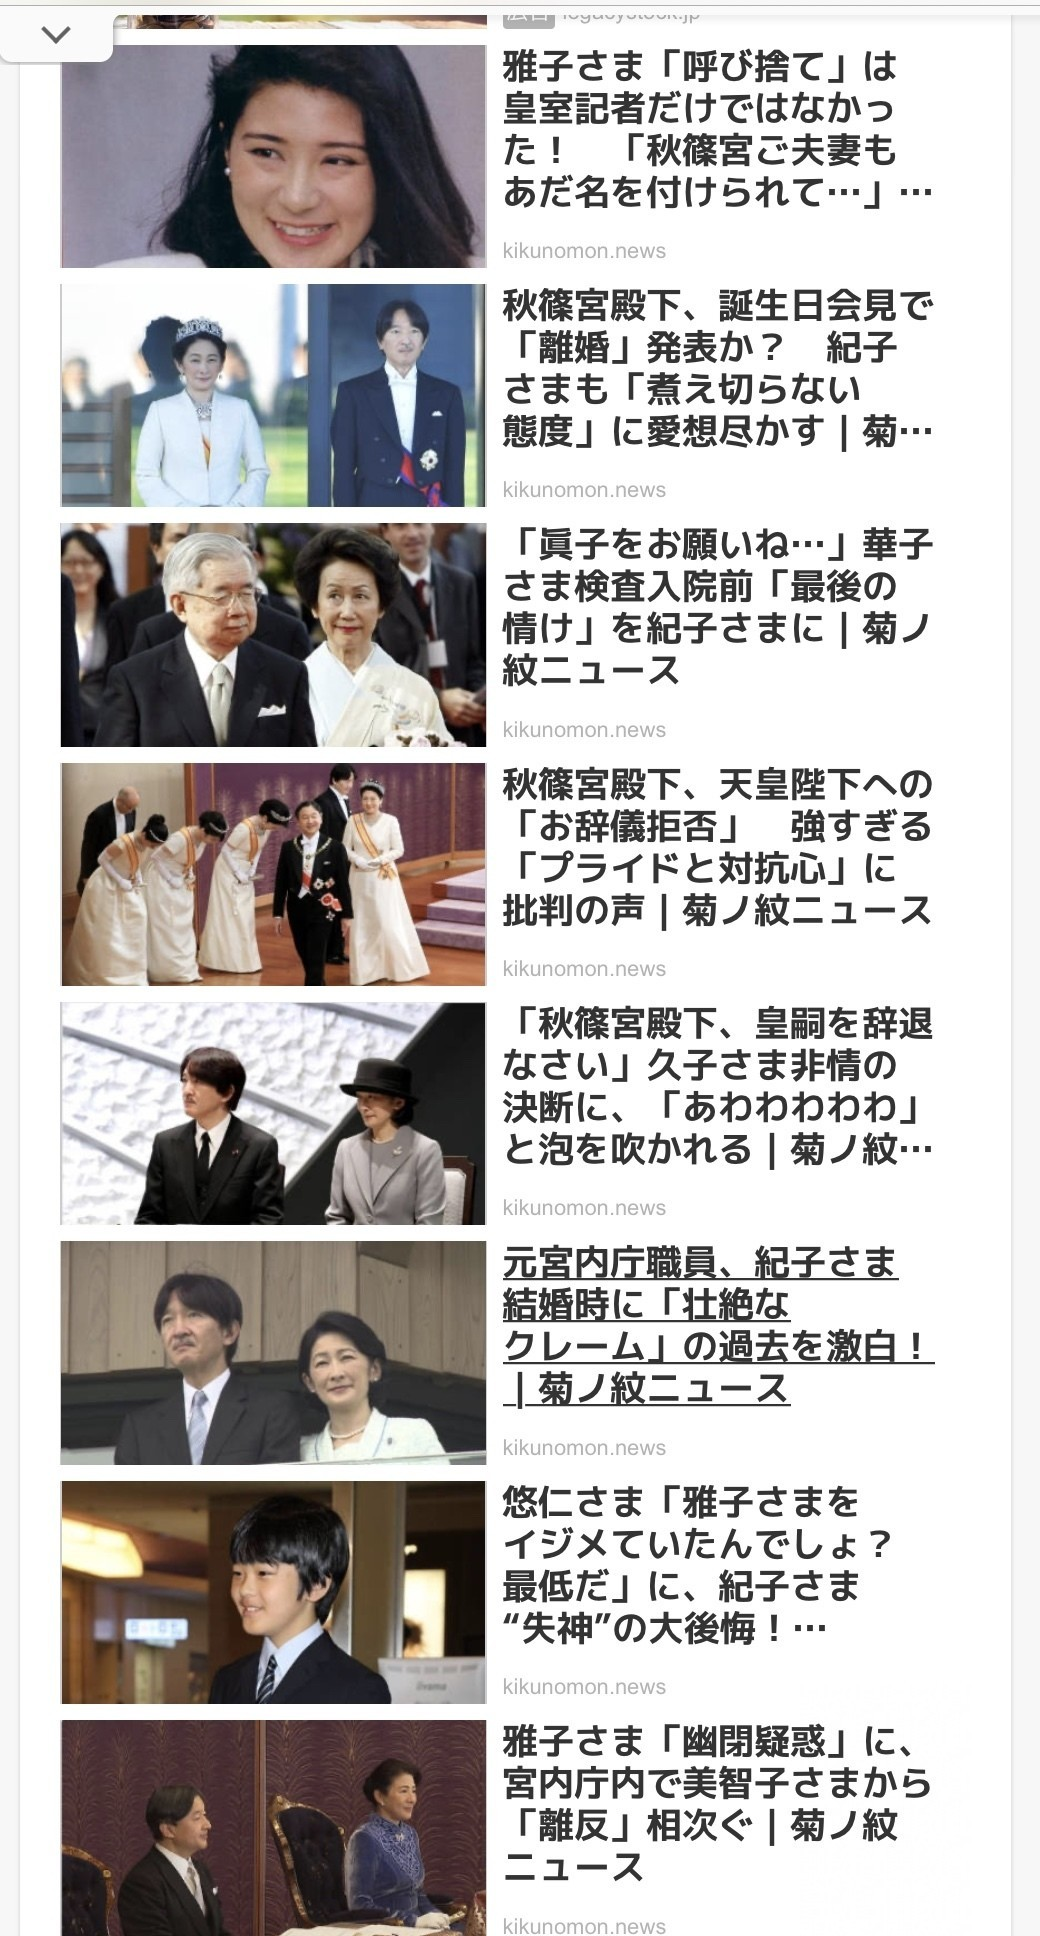 菊 の 紋 ニュース と は